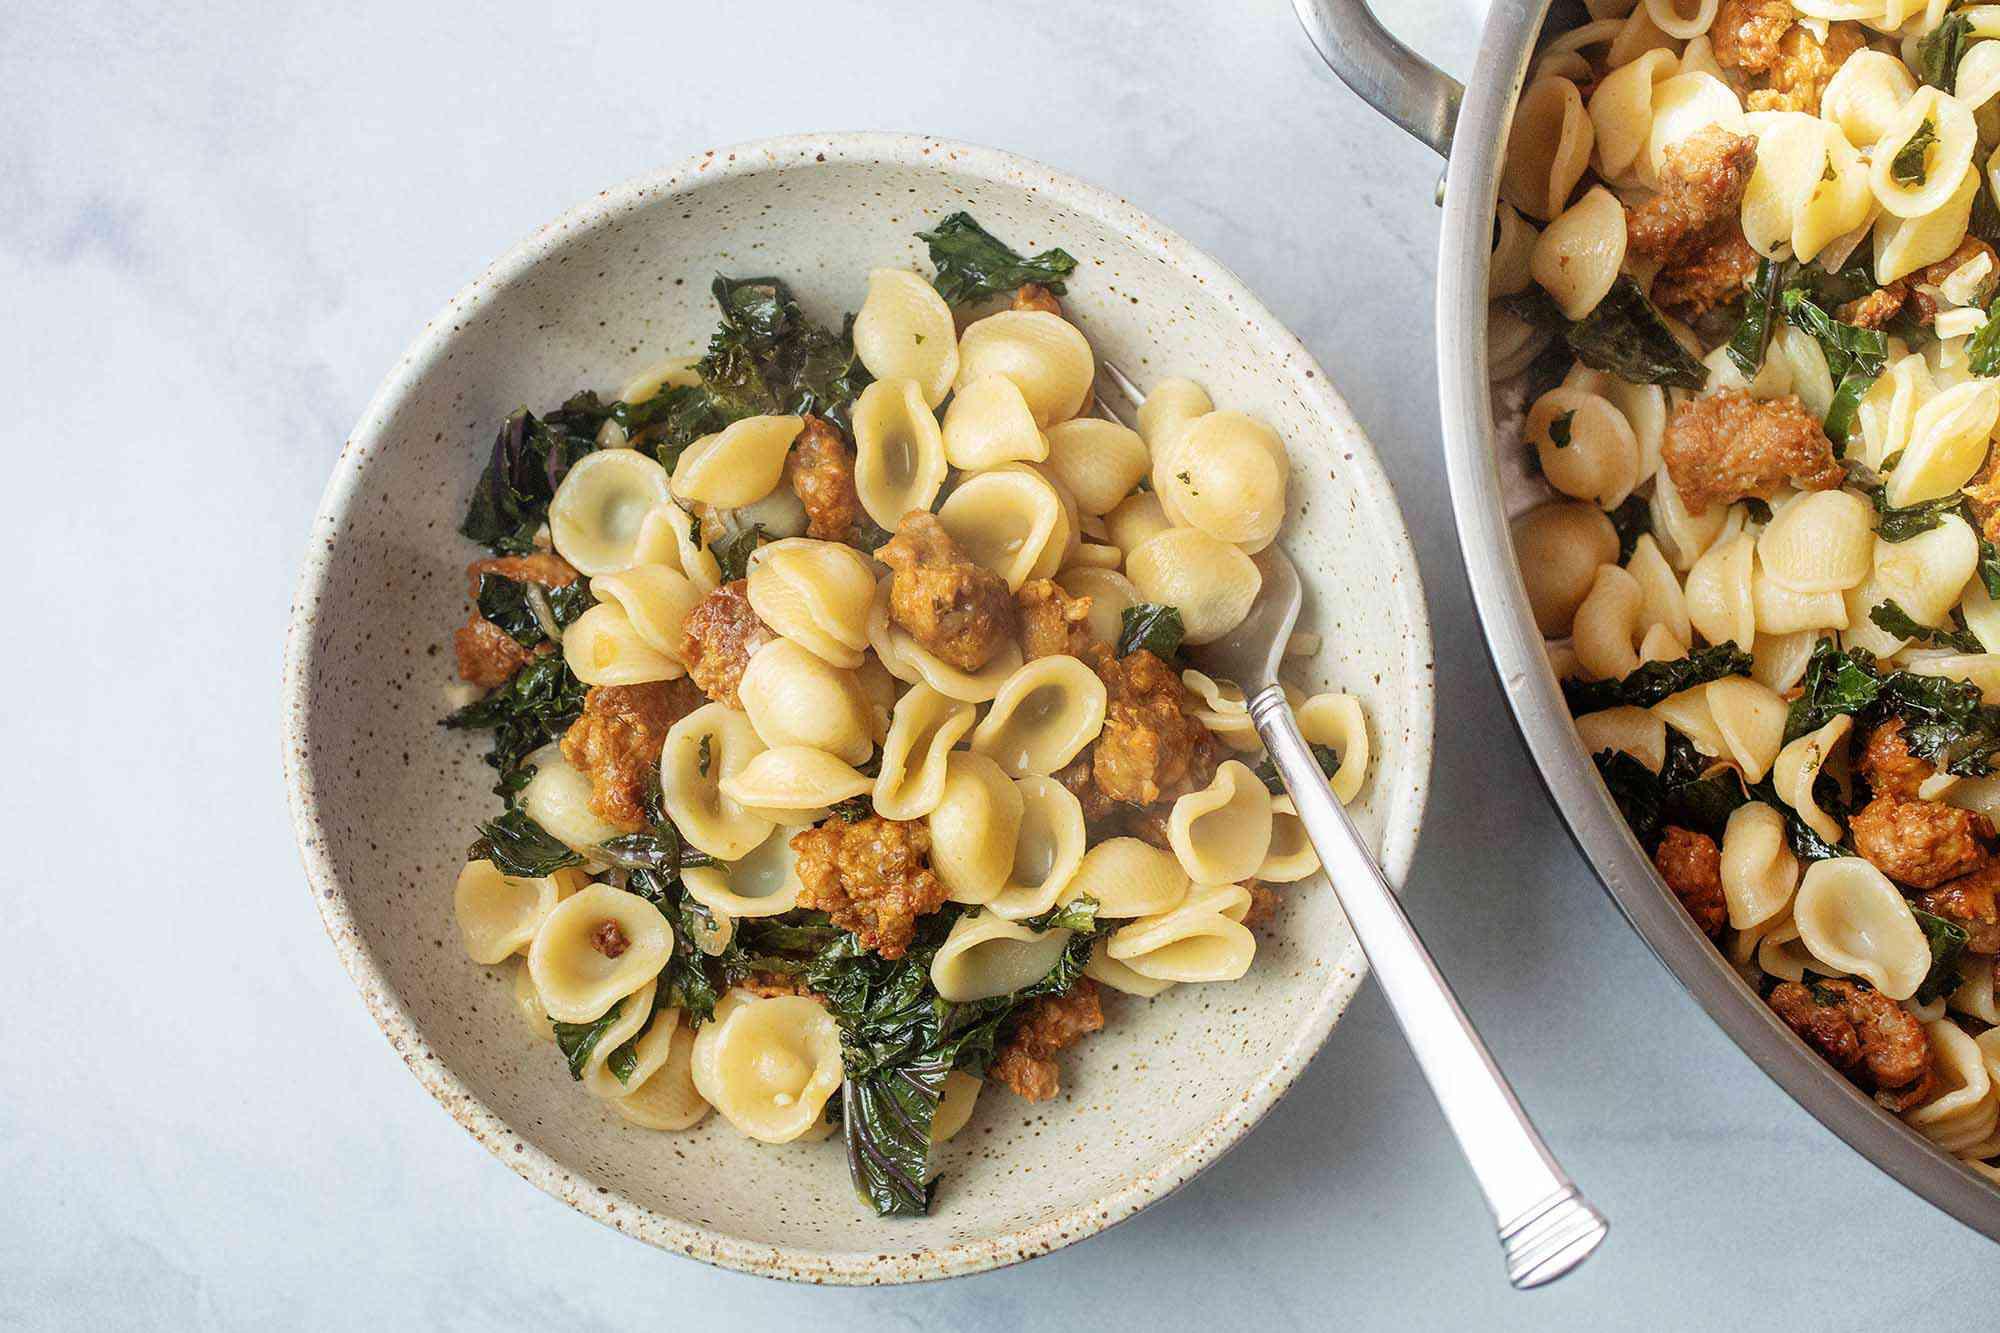 Orecchiette Pasta with Sausage and Kale recipe